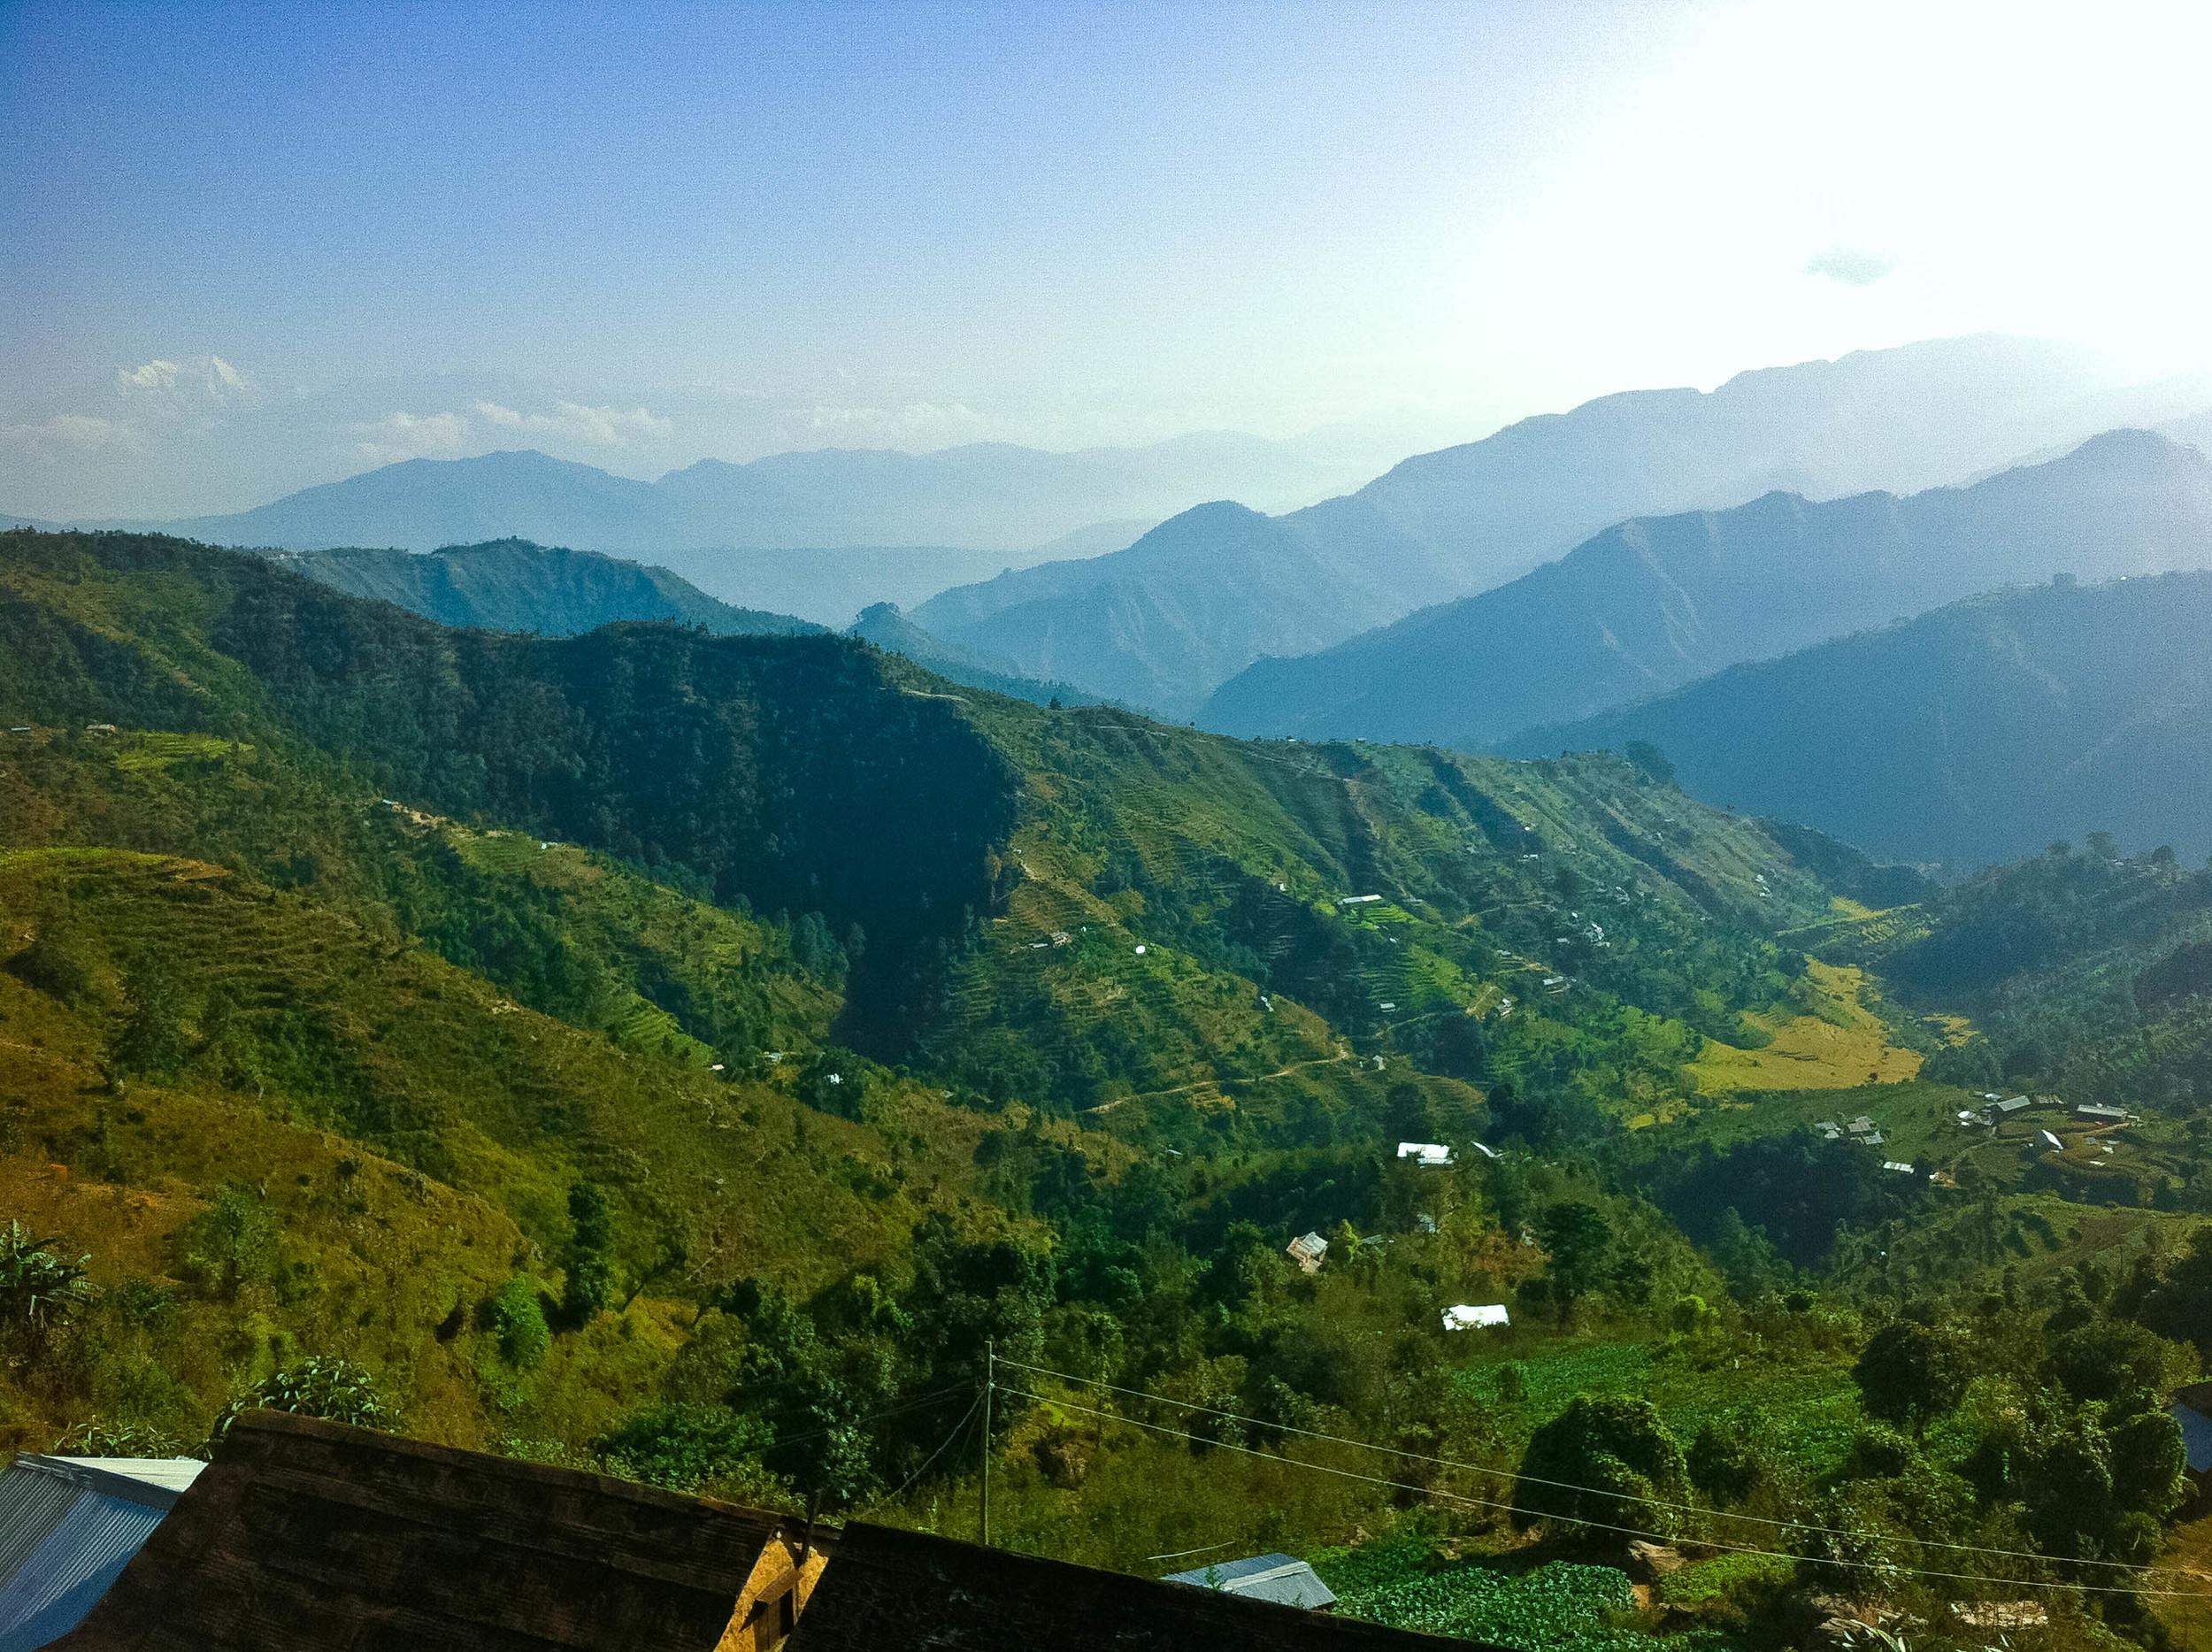 Agara, Makwanpur, with the Annapurna Himalaya faint in the distance.